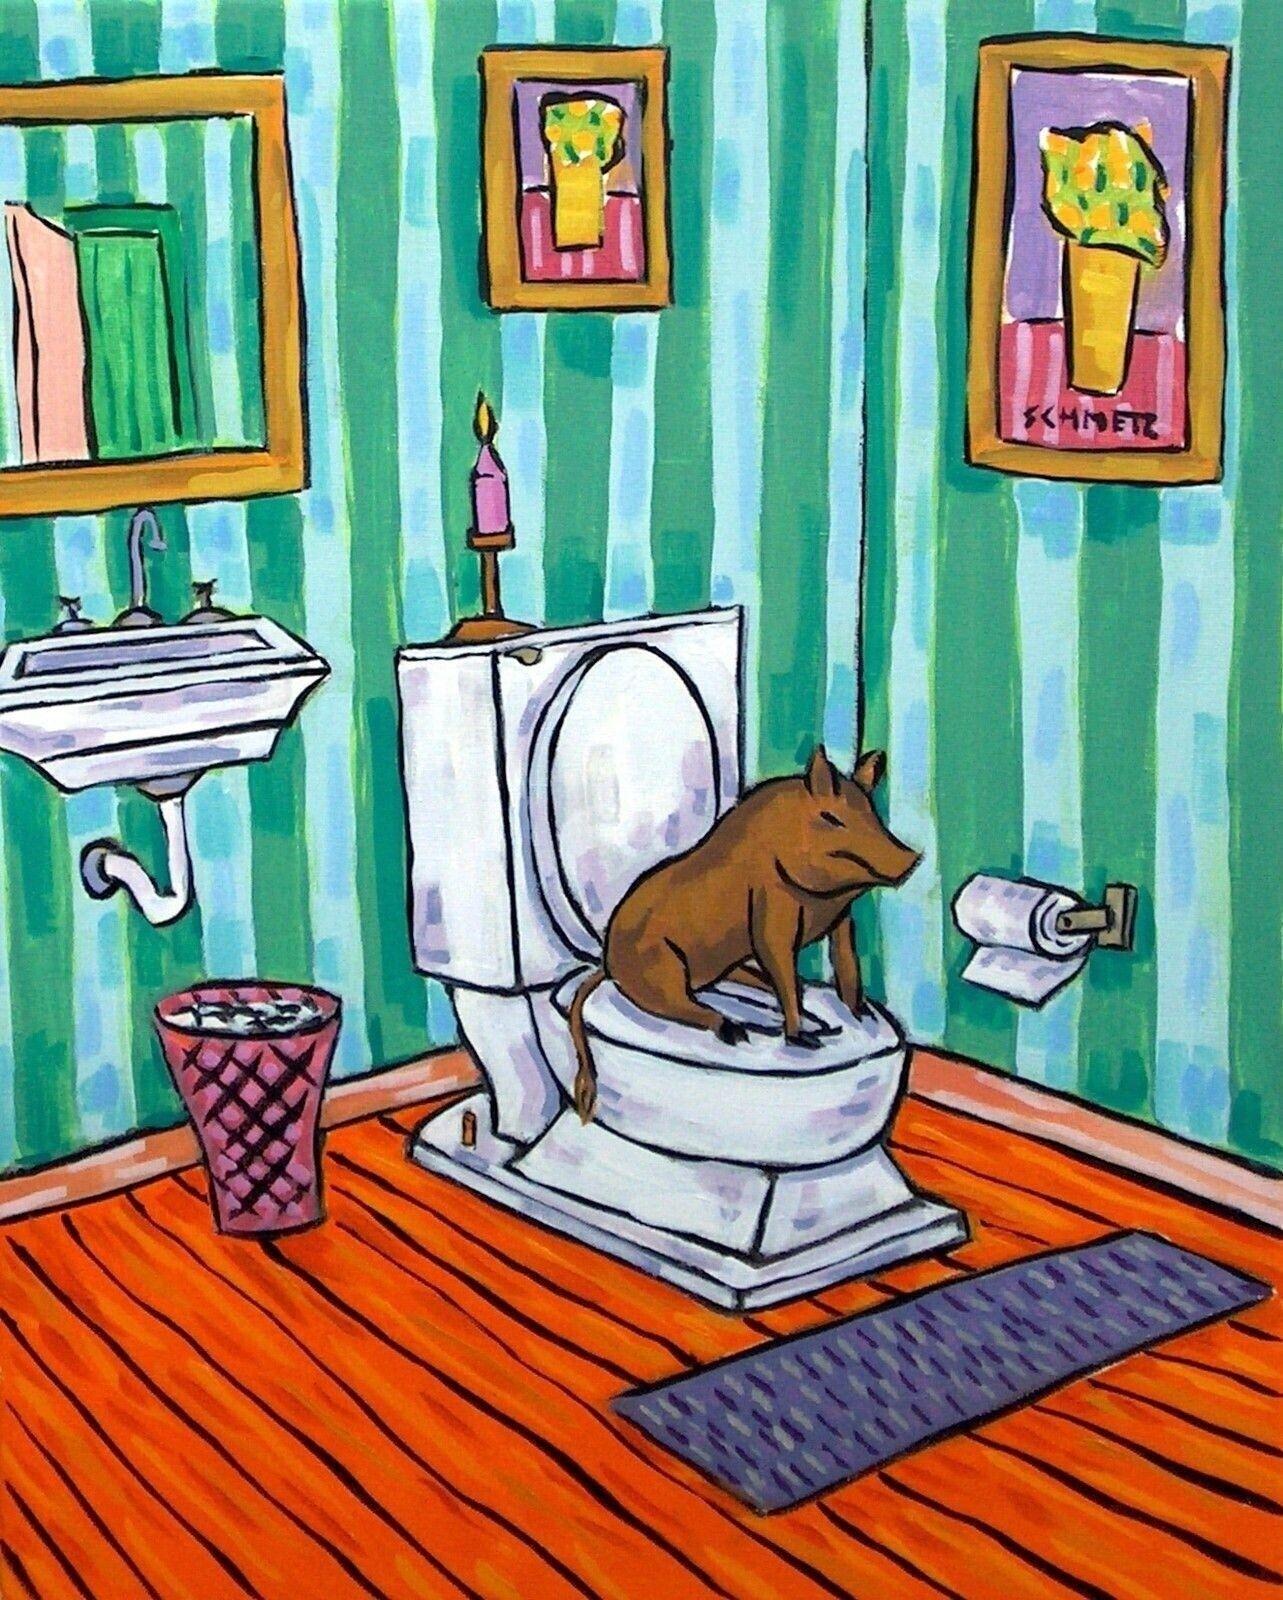 black PIG DIET painting 4x6  GIFT  abstract modern bathroom folk GLOSSY PRINT